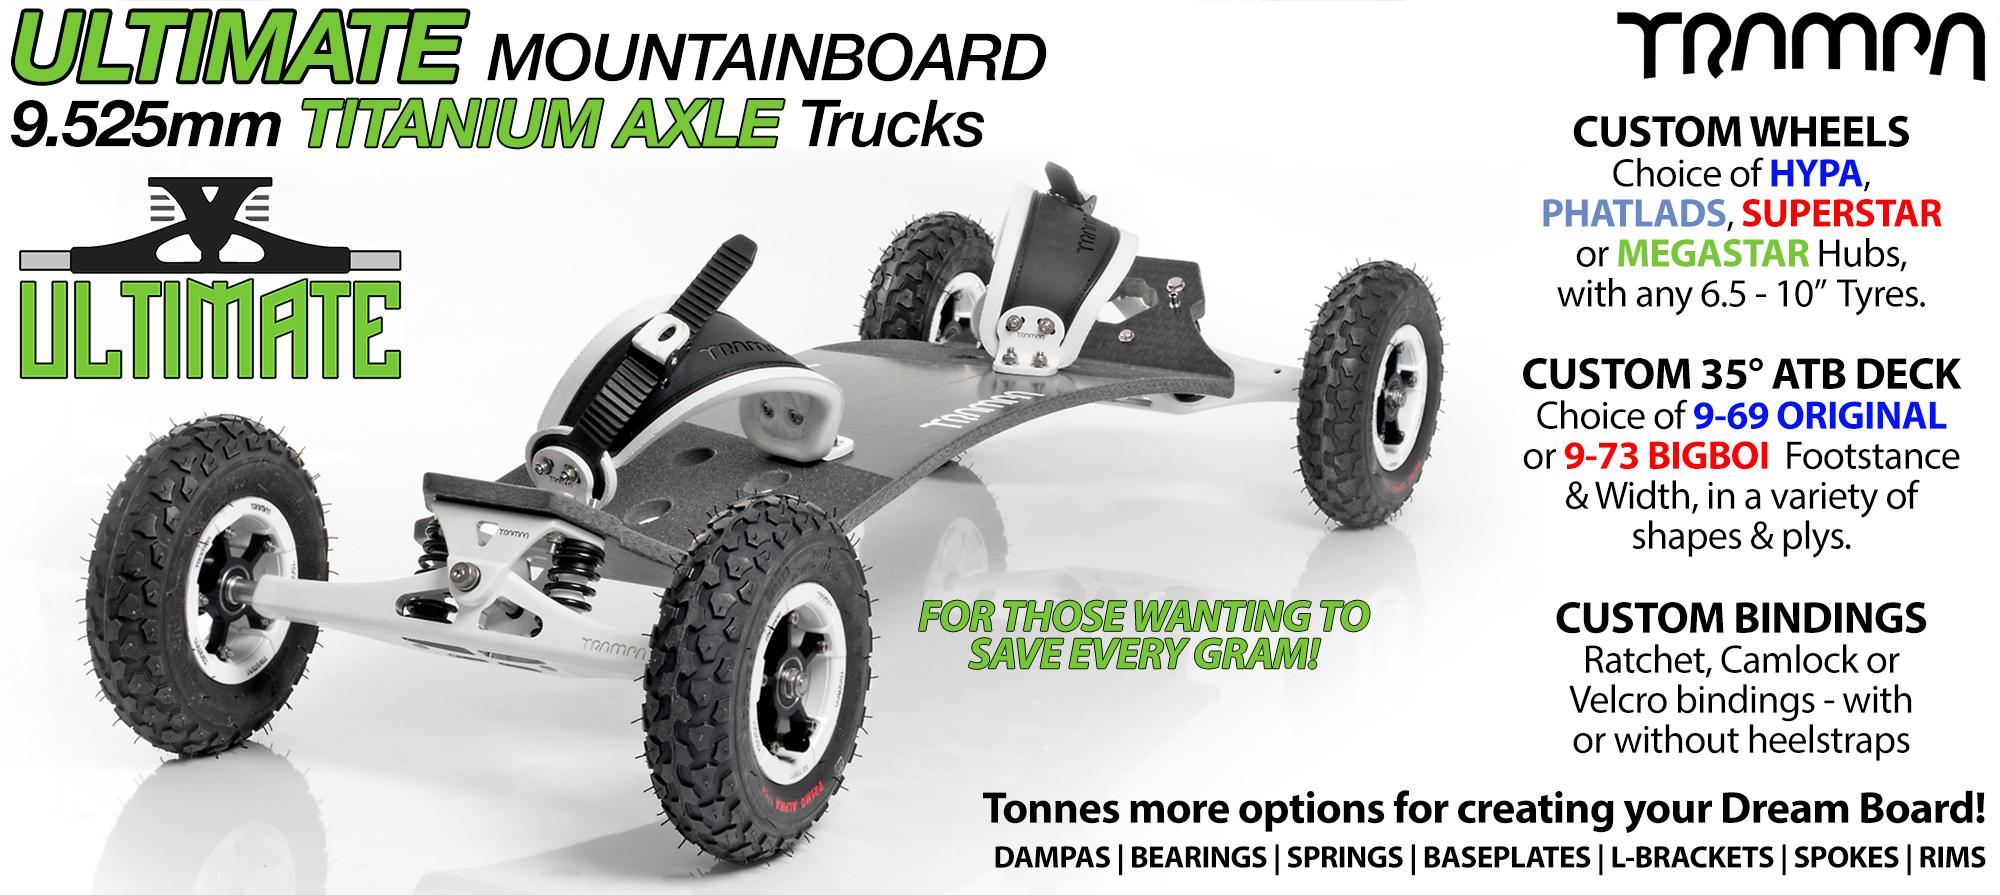 TRAMPA Mountainboard with 9.525mm TITANIUM Axle ULTIMATE Trucks RATCHET Bindings & Custom Wheels